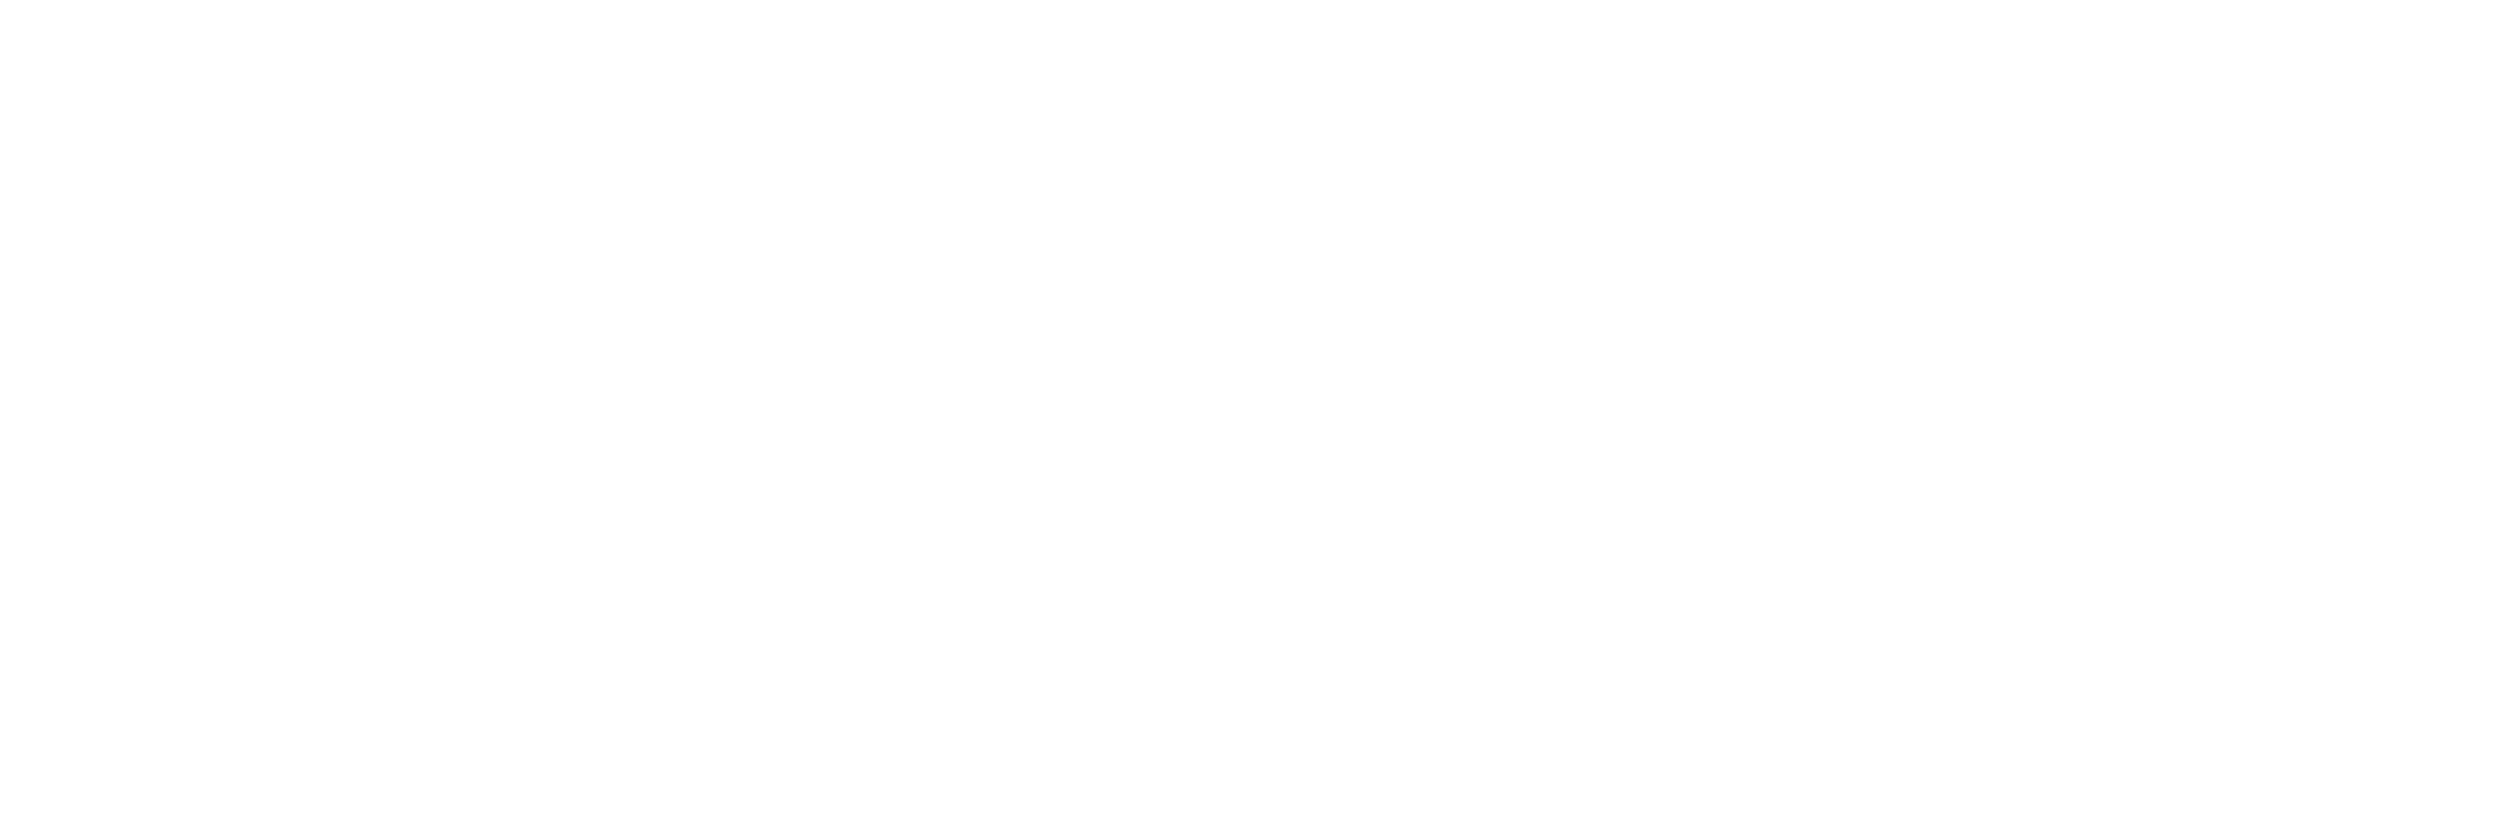 Digital Design-logo-white.png